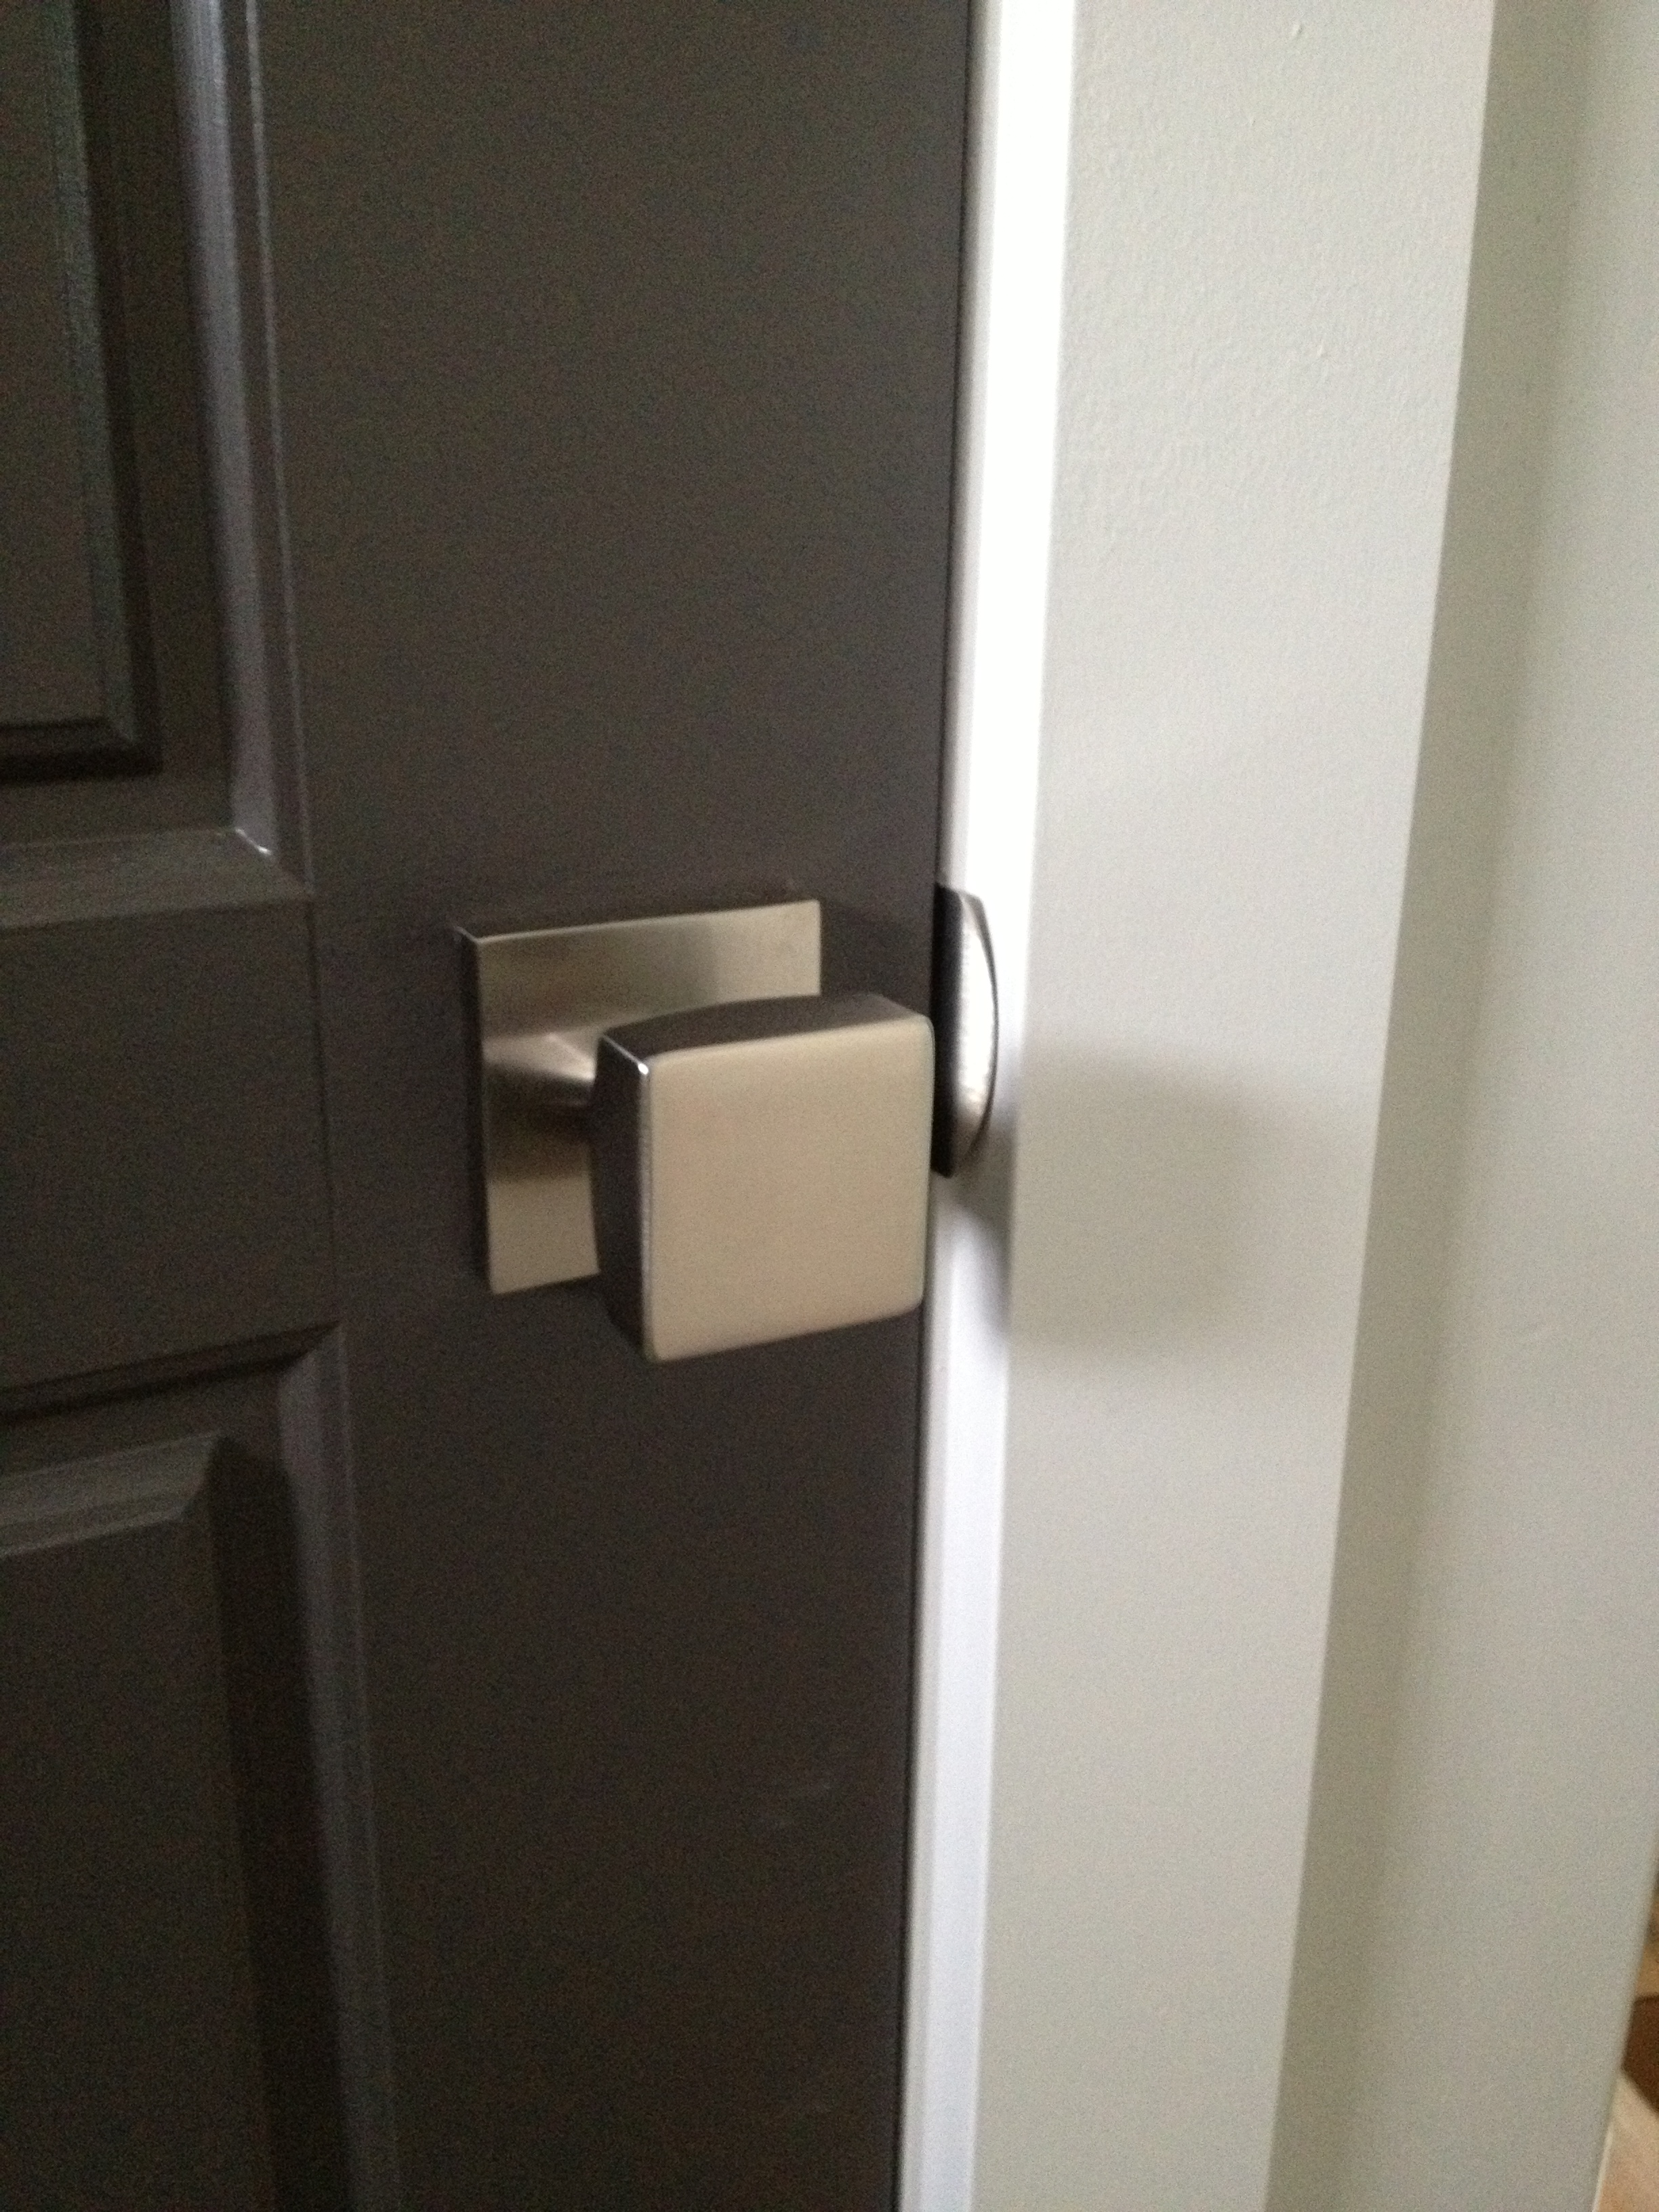 Installation Of Your Emtek Square Modern Door Knob With Square Rosette  Complete.